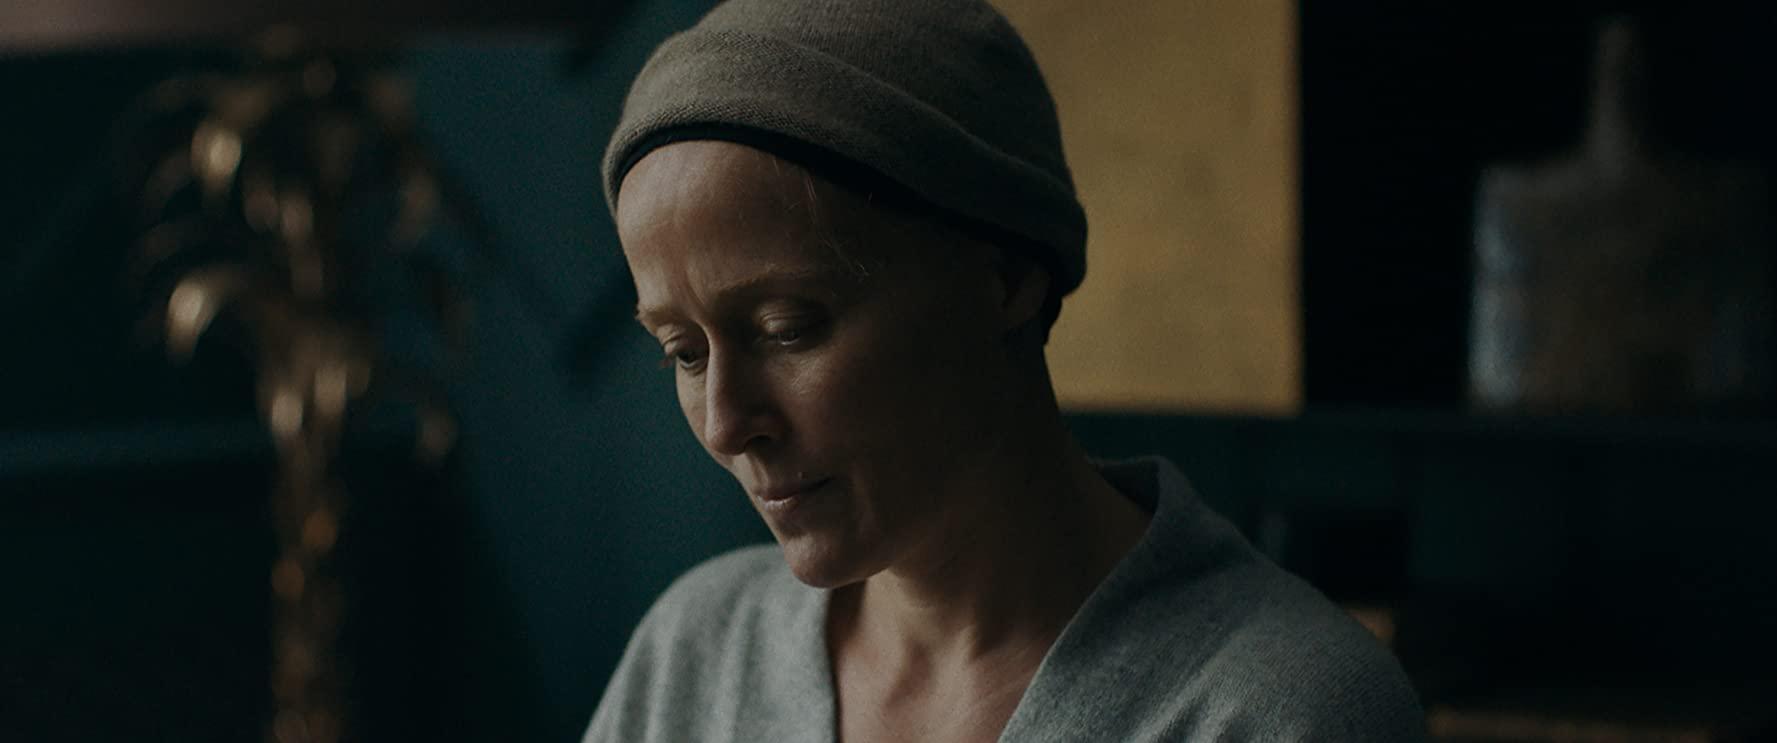 Saint Maud (2019, UK) Review